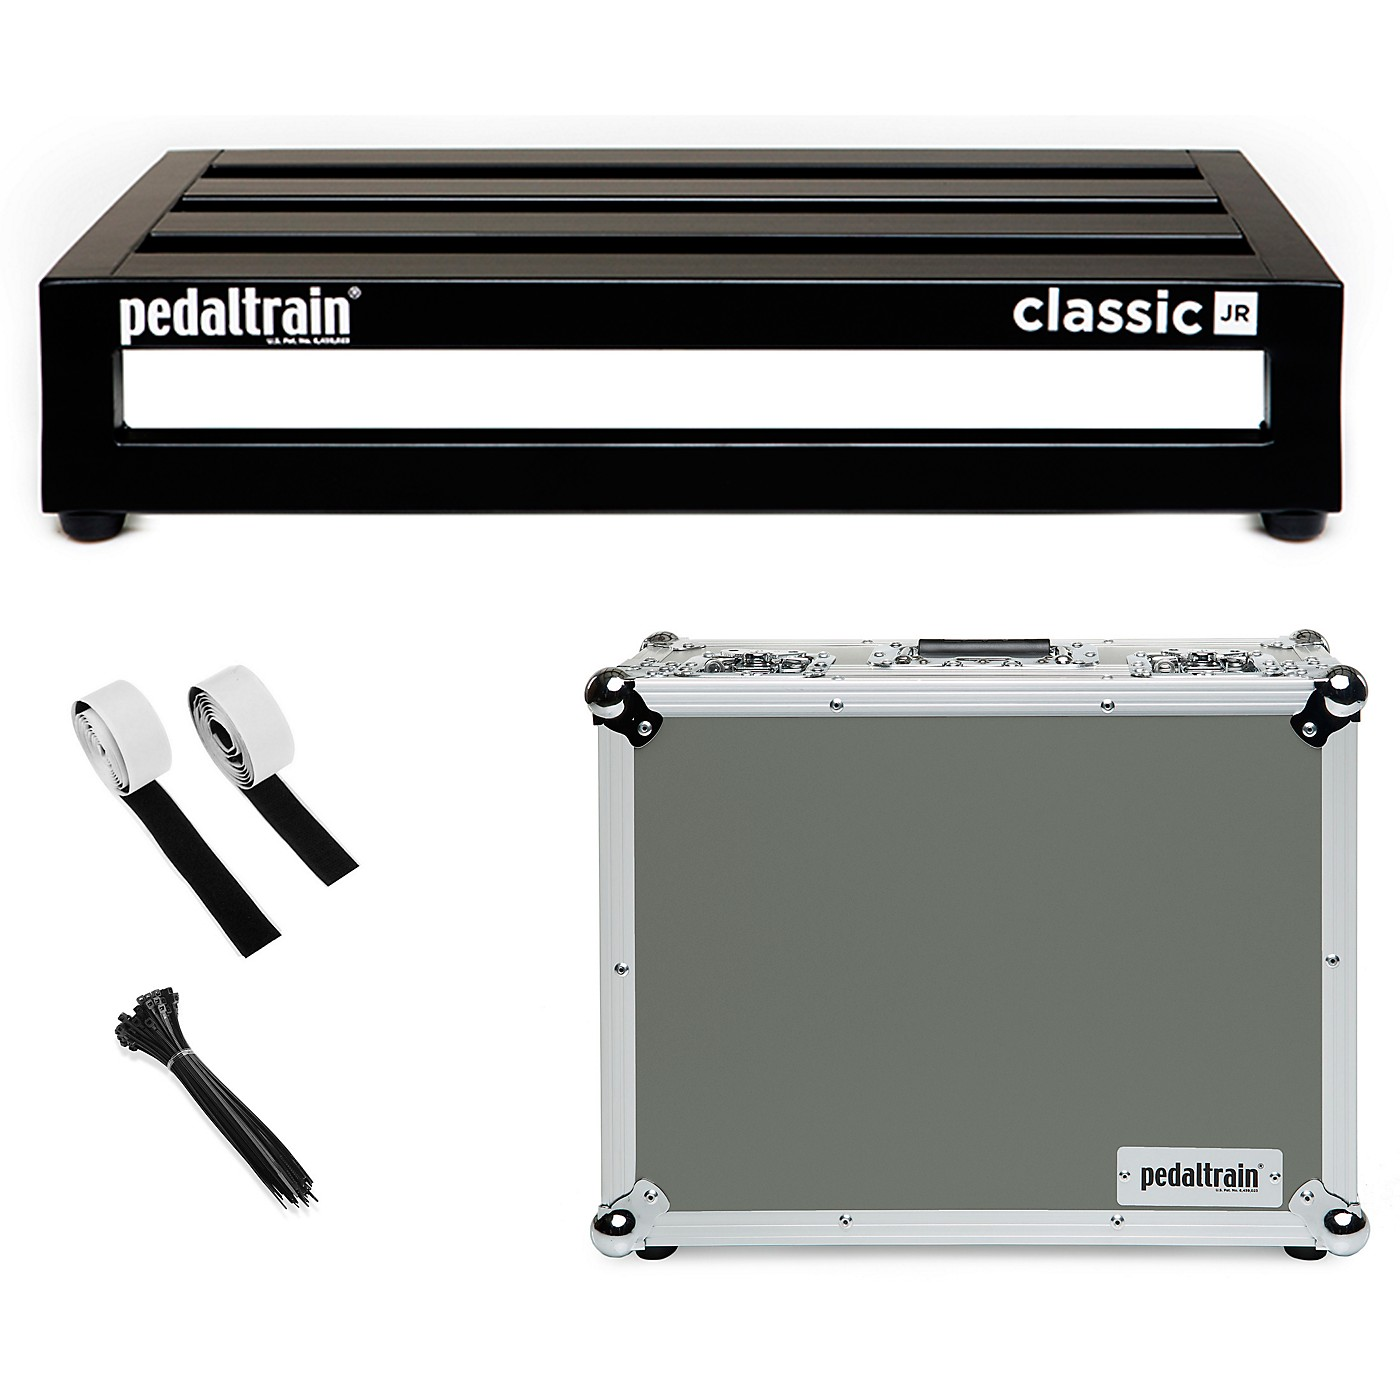 Pedaltrain Classic JR. Pedalboard thumbnail